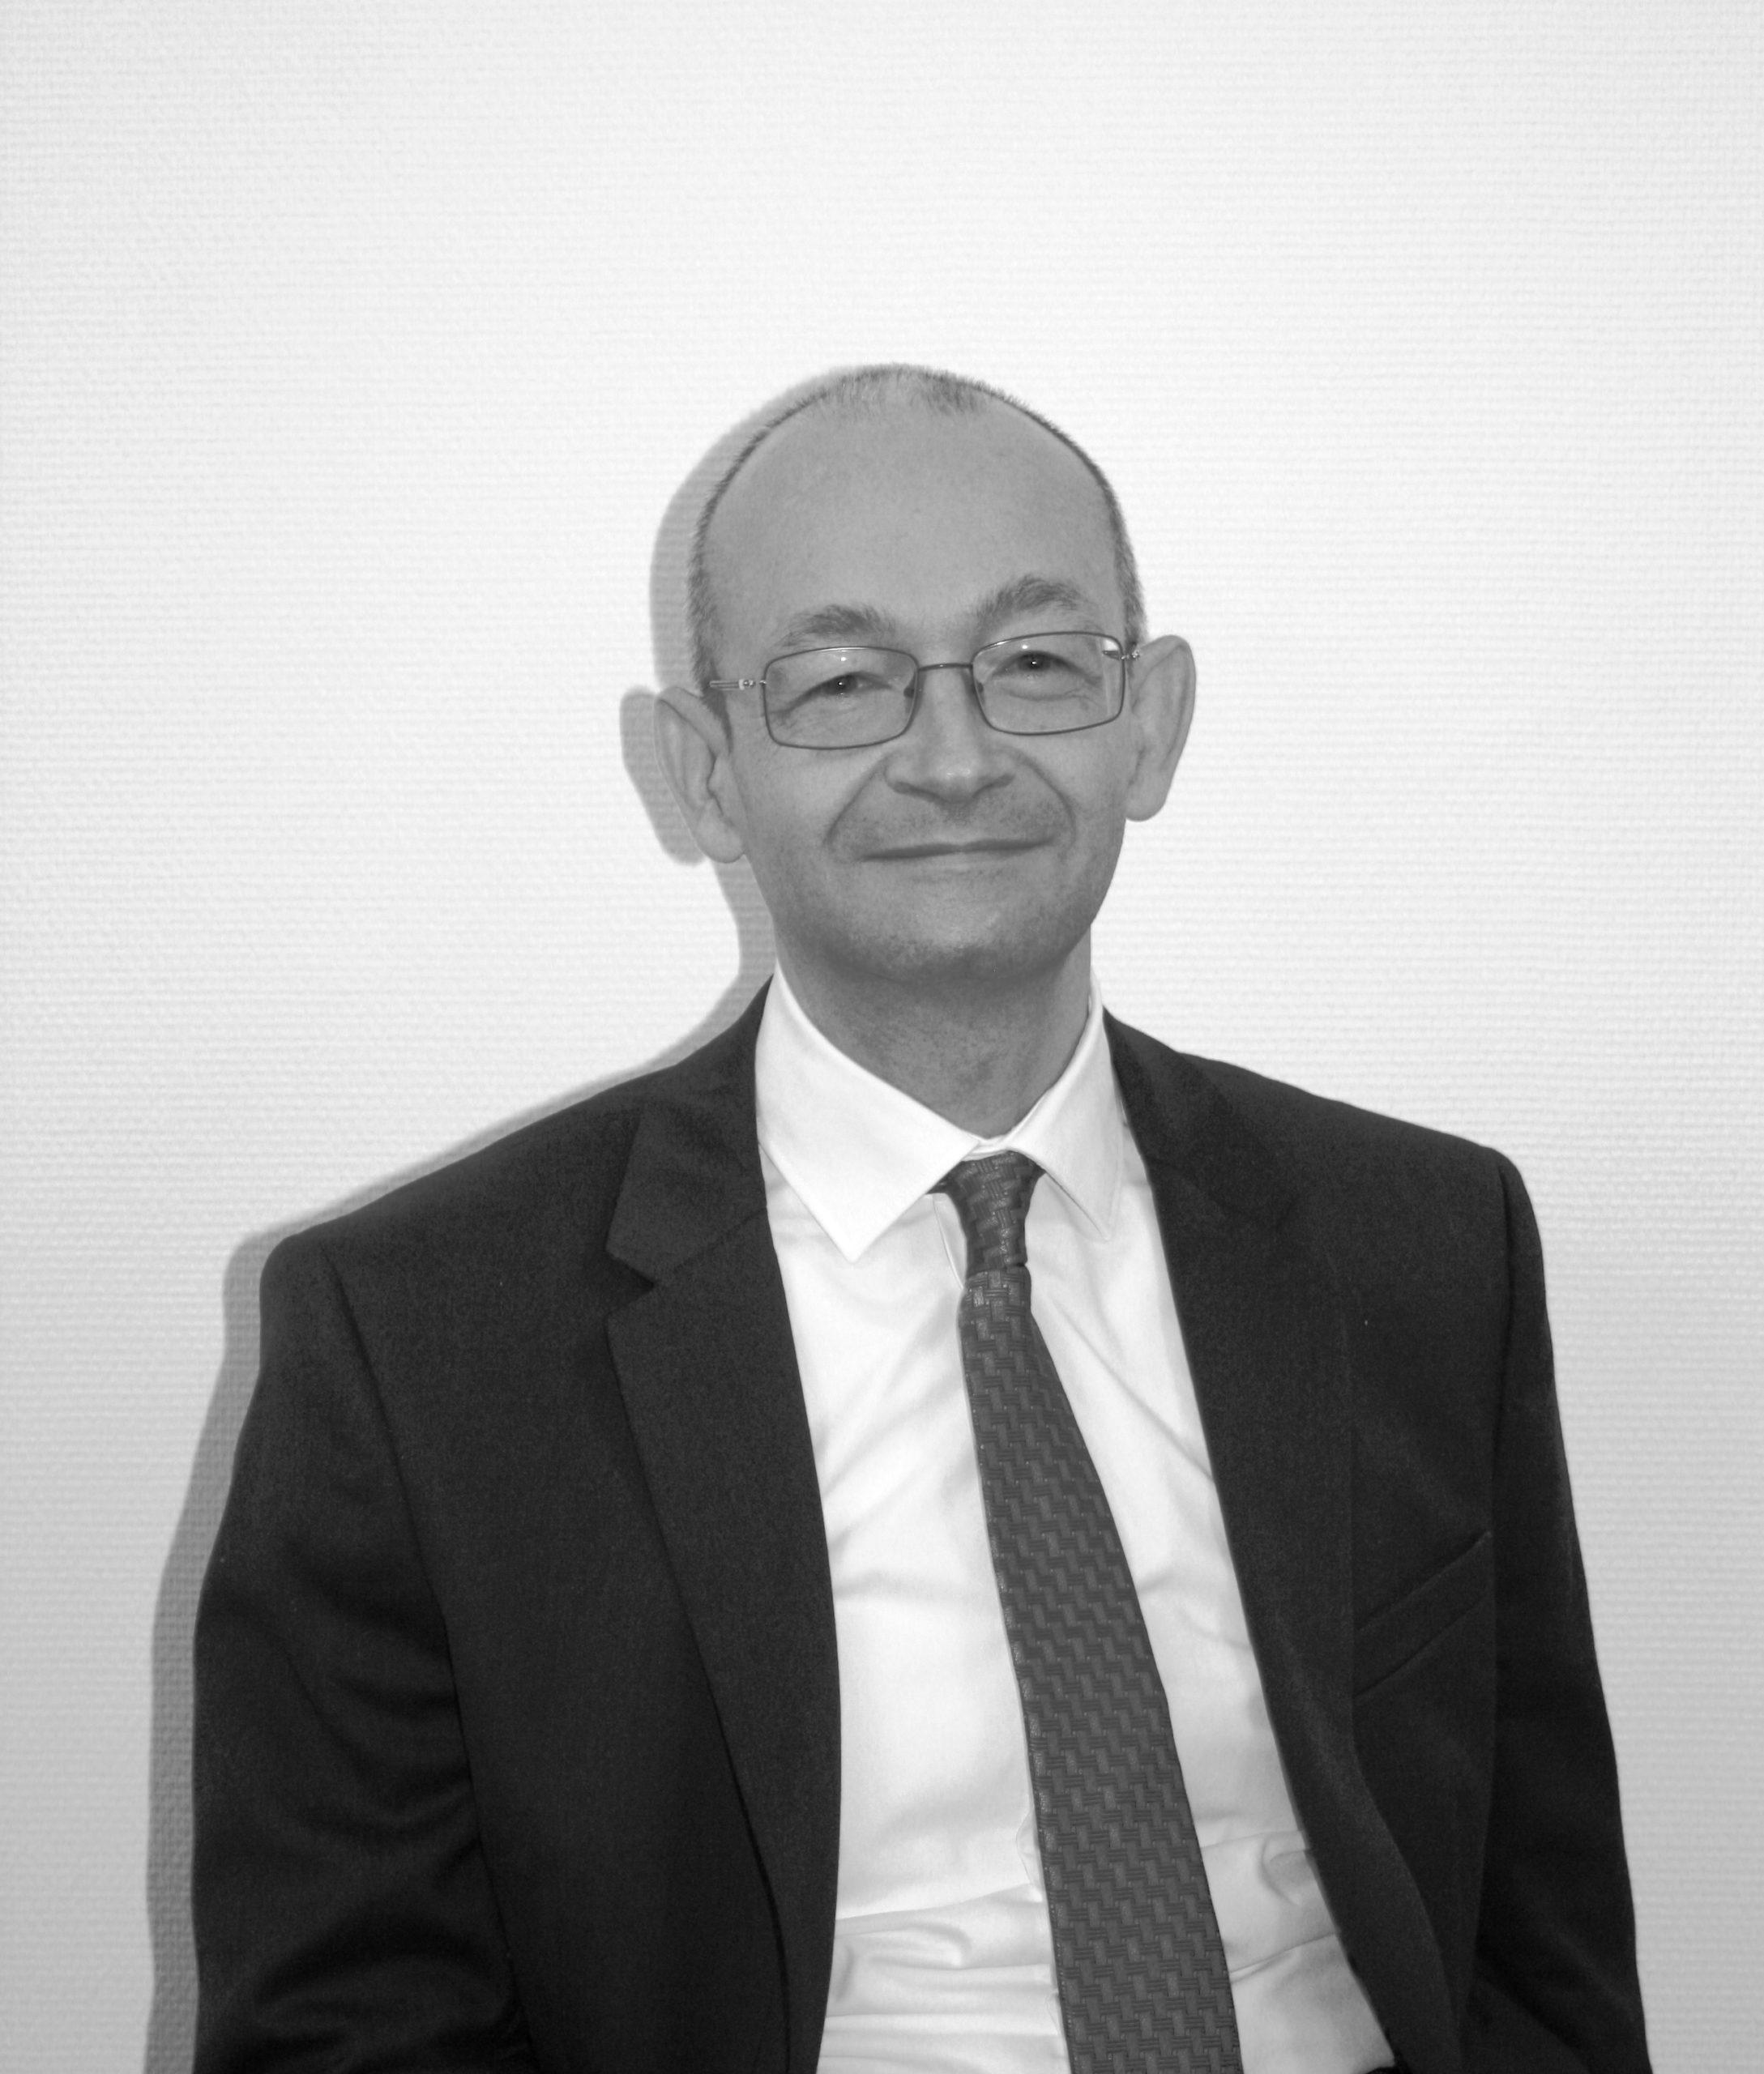 Marc Serafini